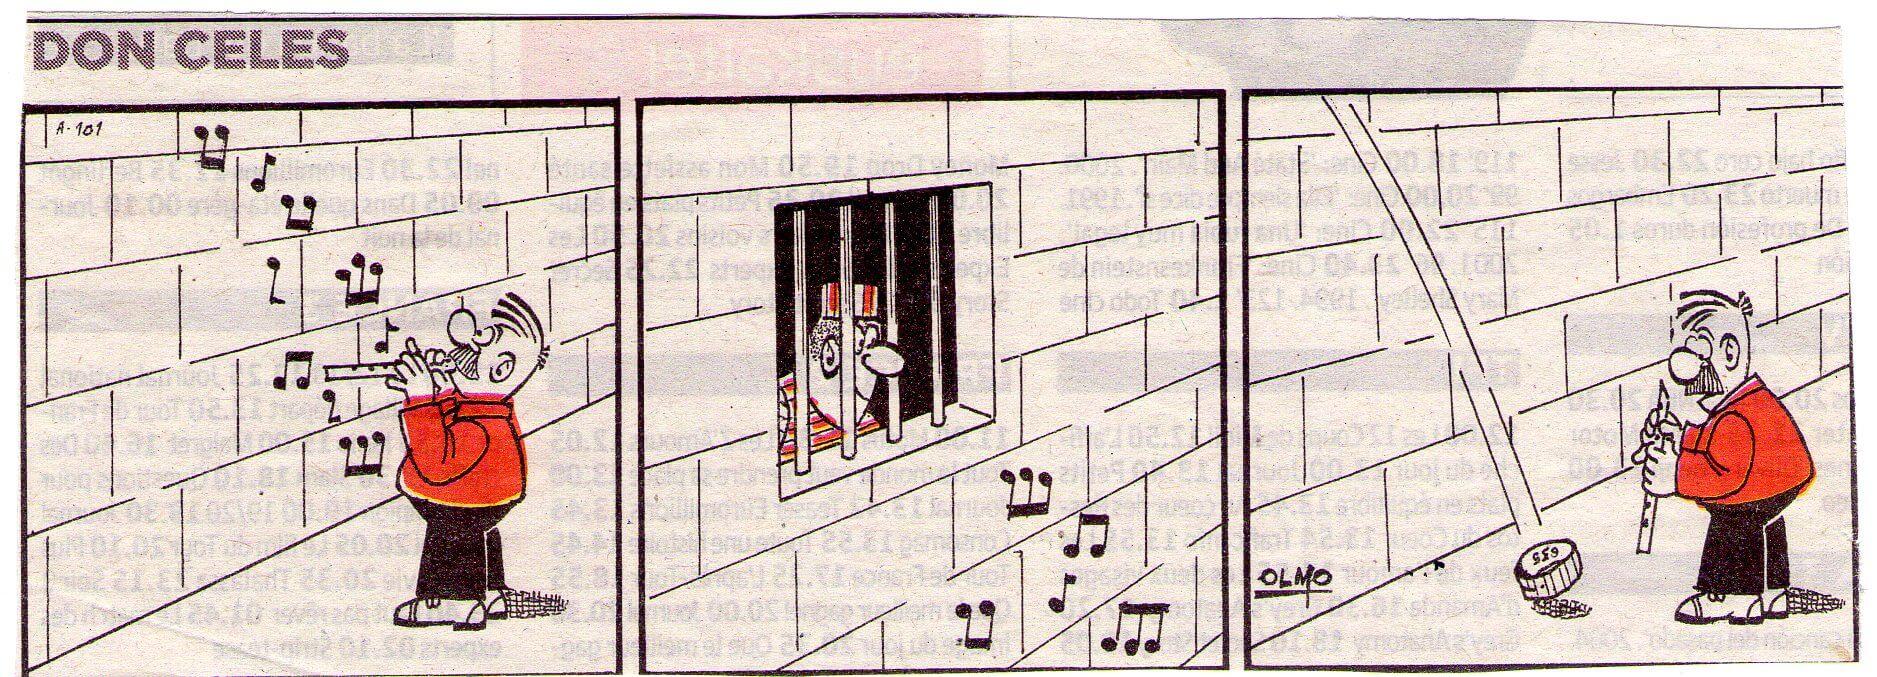 Don Celes tocando para los presos